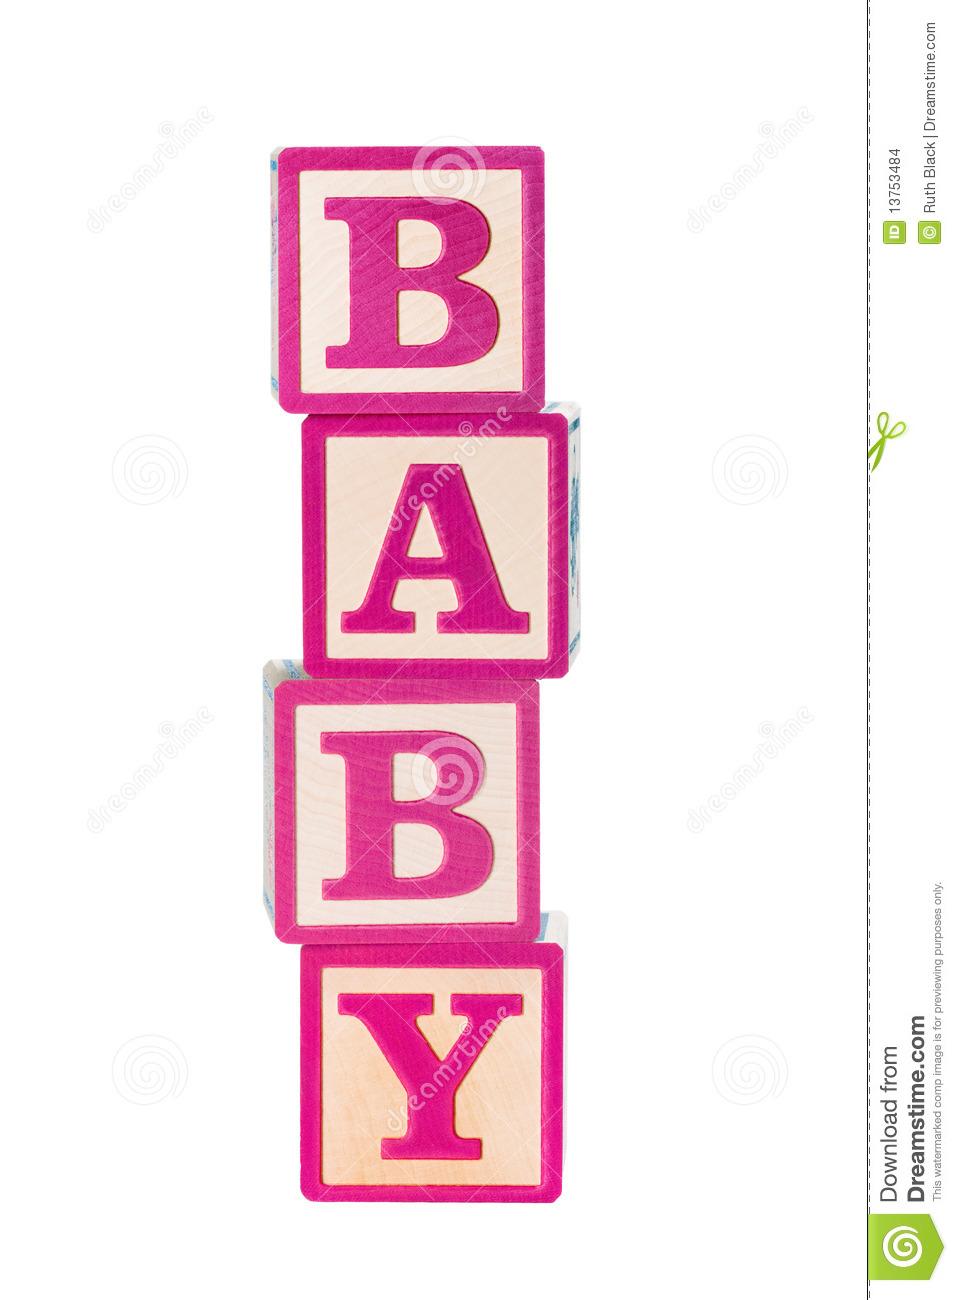 957x1300 Baby Building Blocks Clipart